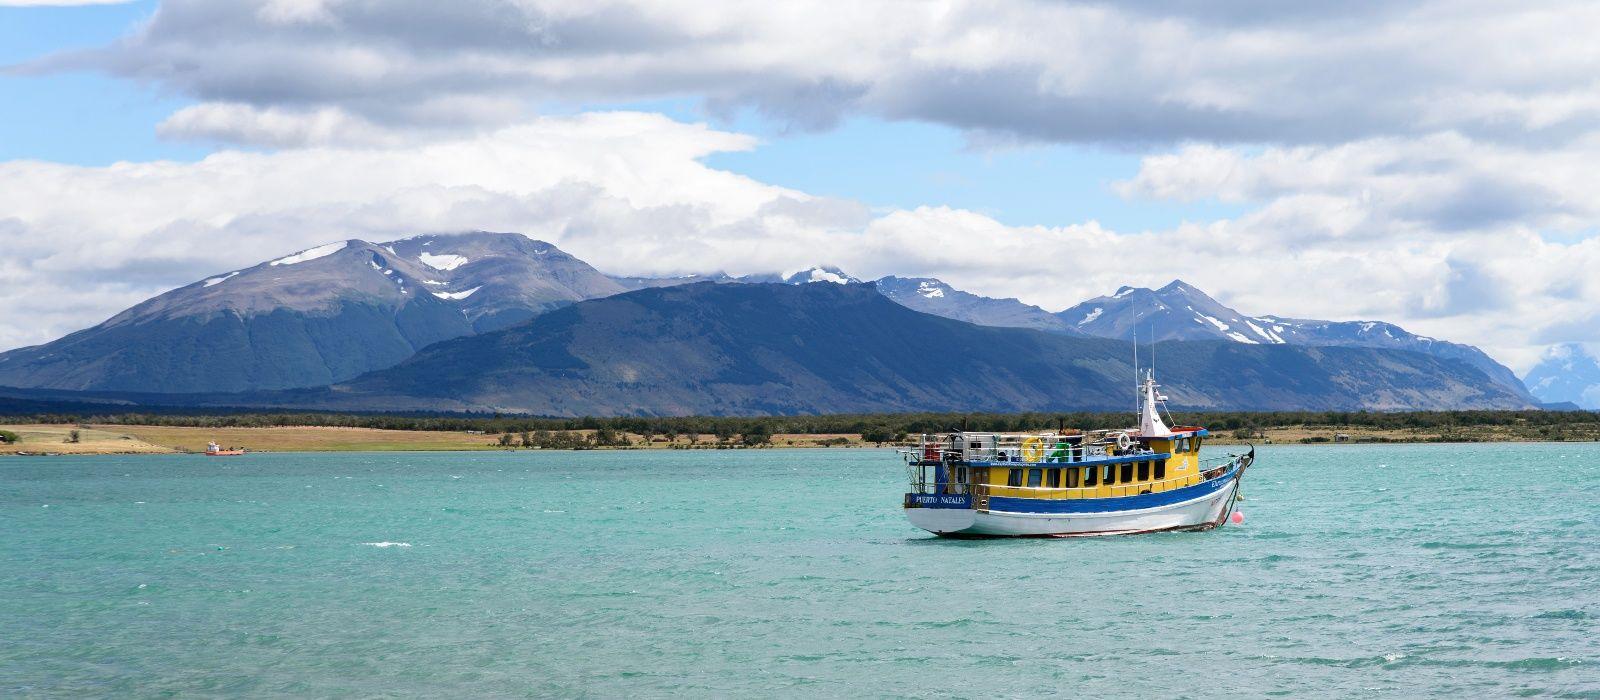 Destination Puerto Natales Cruise Chile